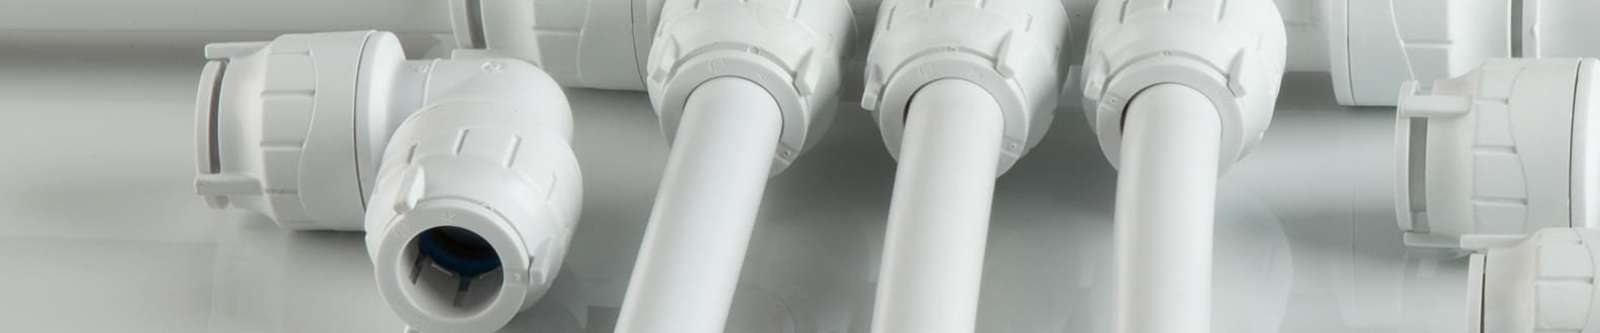 PolyFit - Quickfix push-fit plumbing